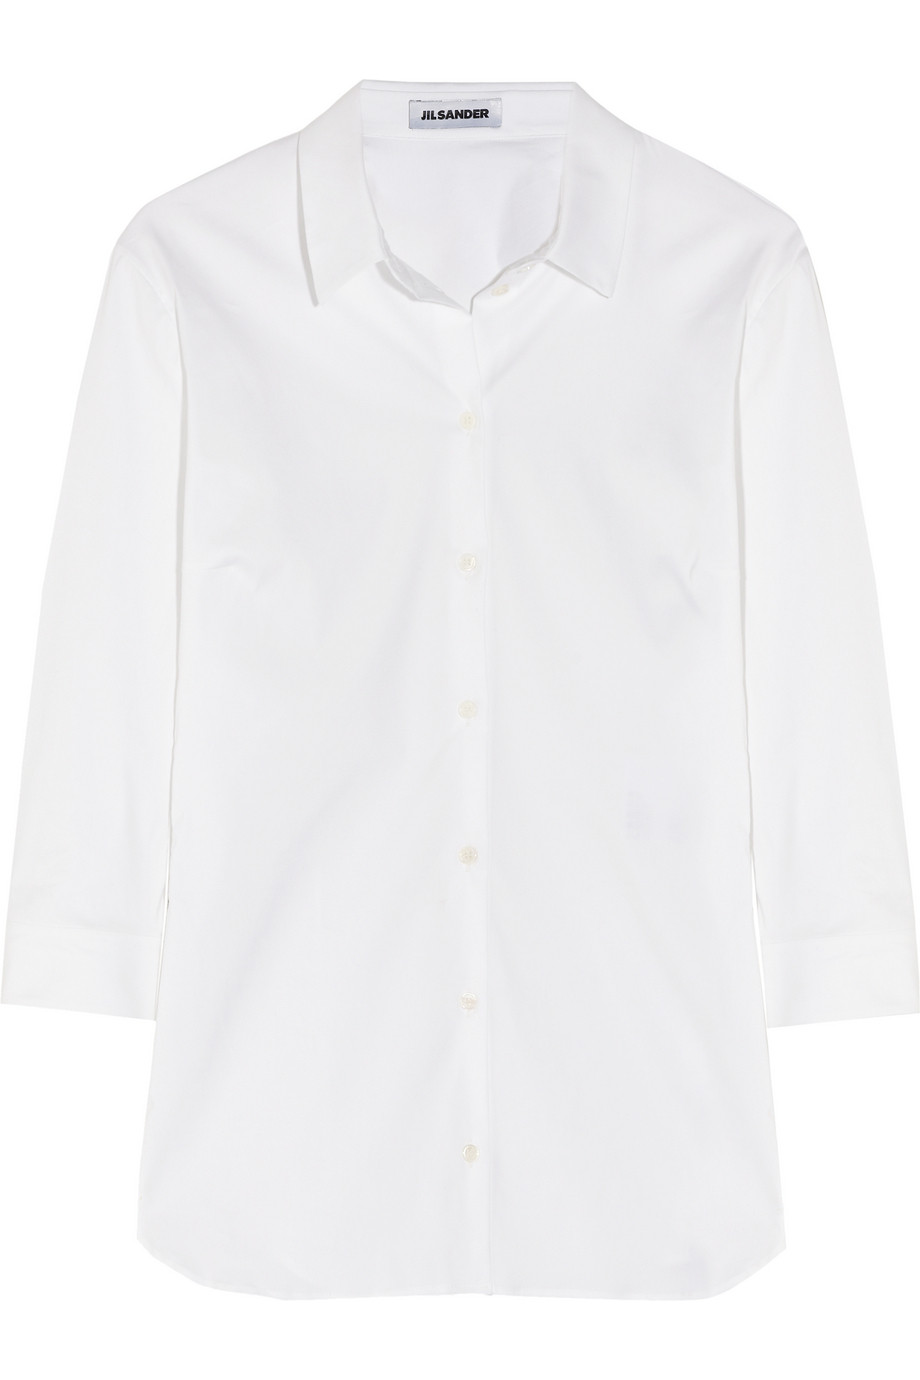 blusa blanca 1